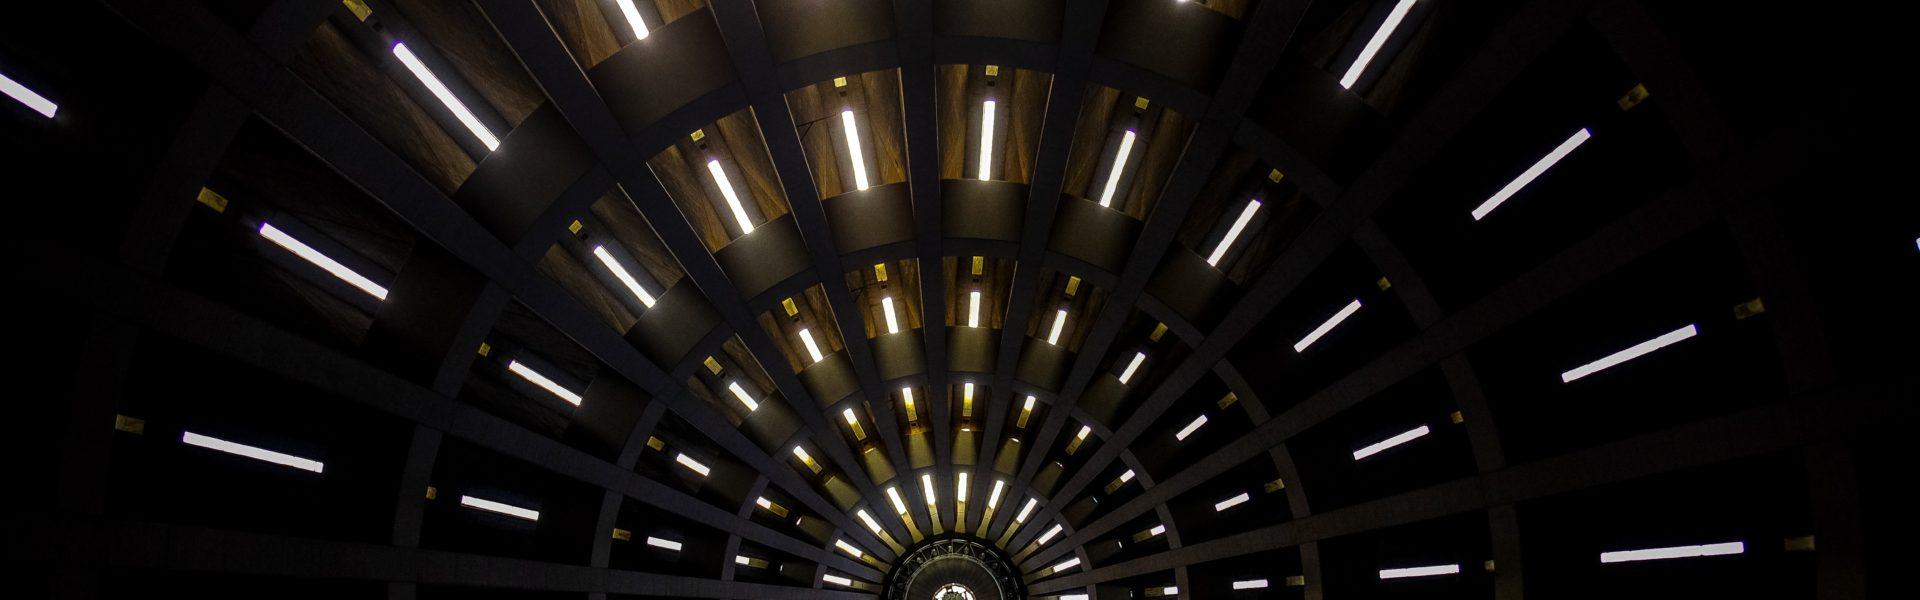 cropped-abstract-art-blur-96381-1.jpg